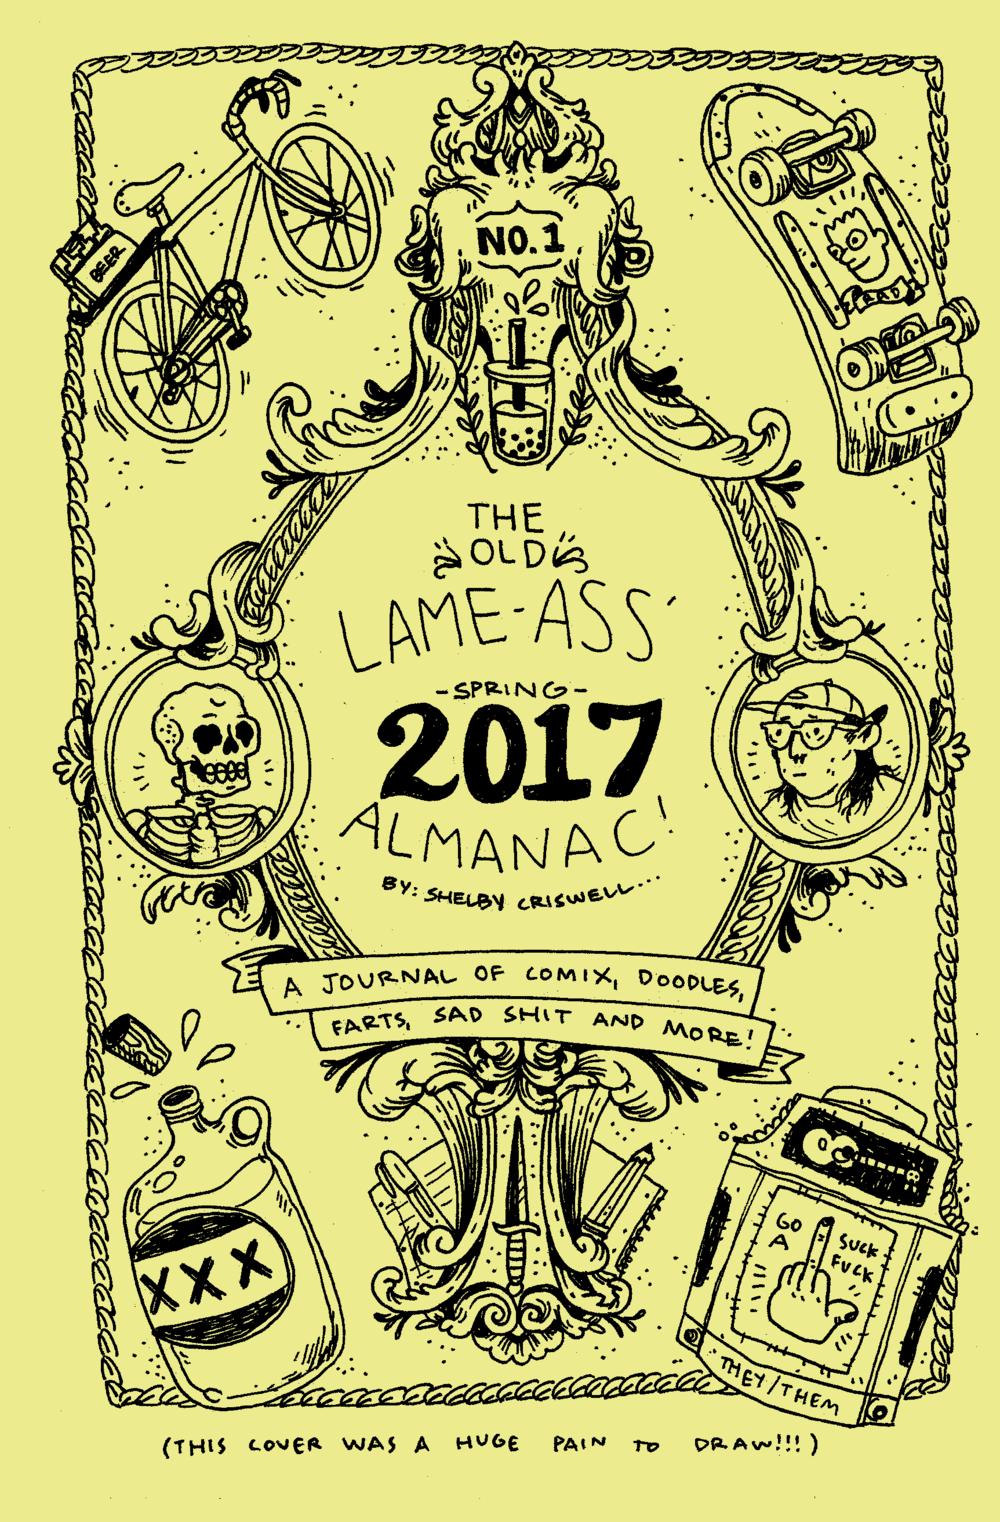 almanac.spring_00.png